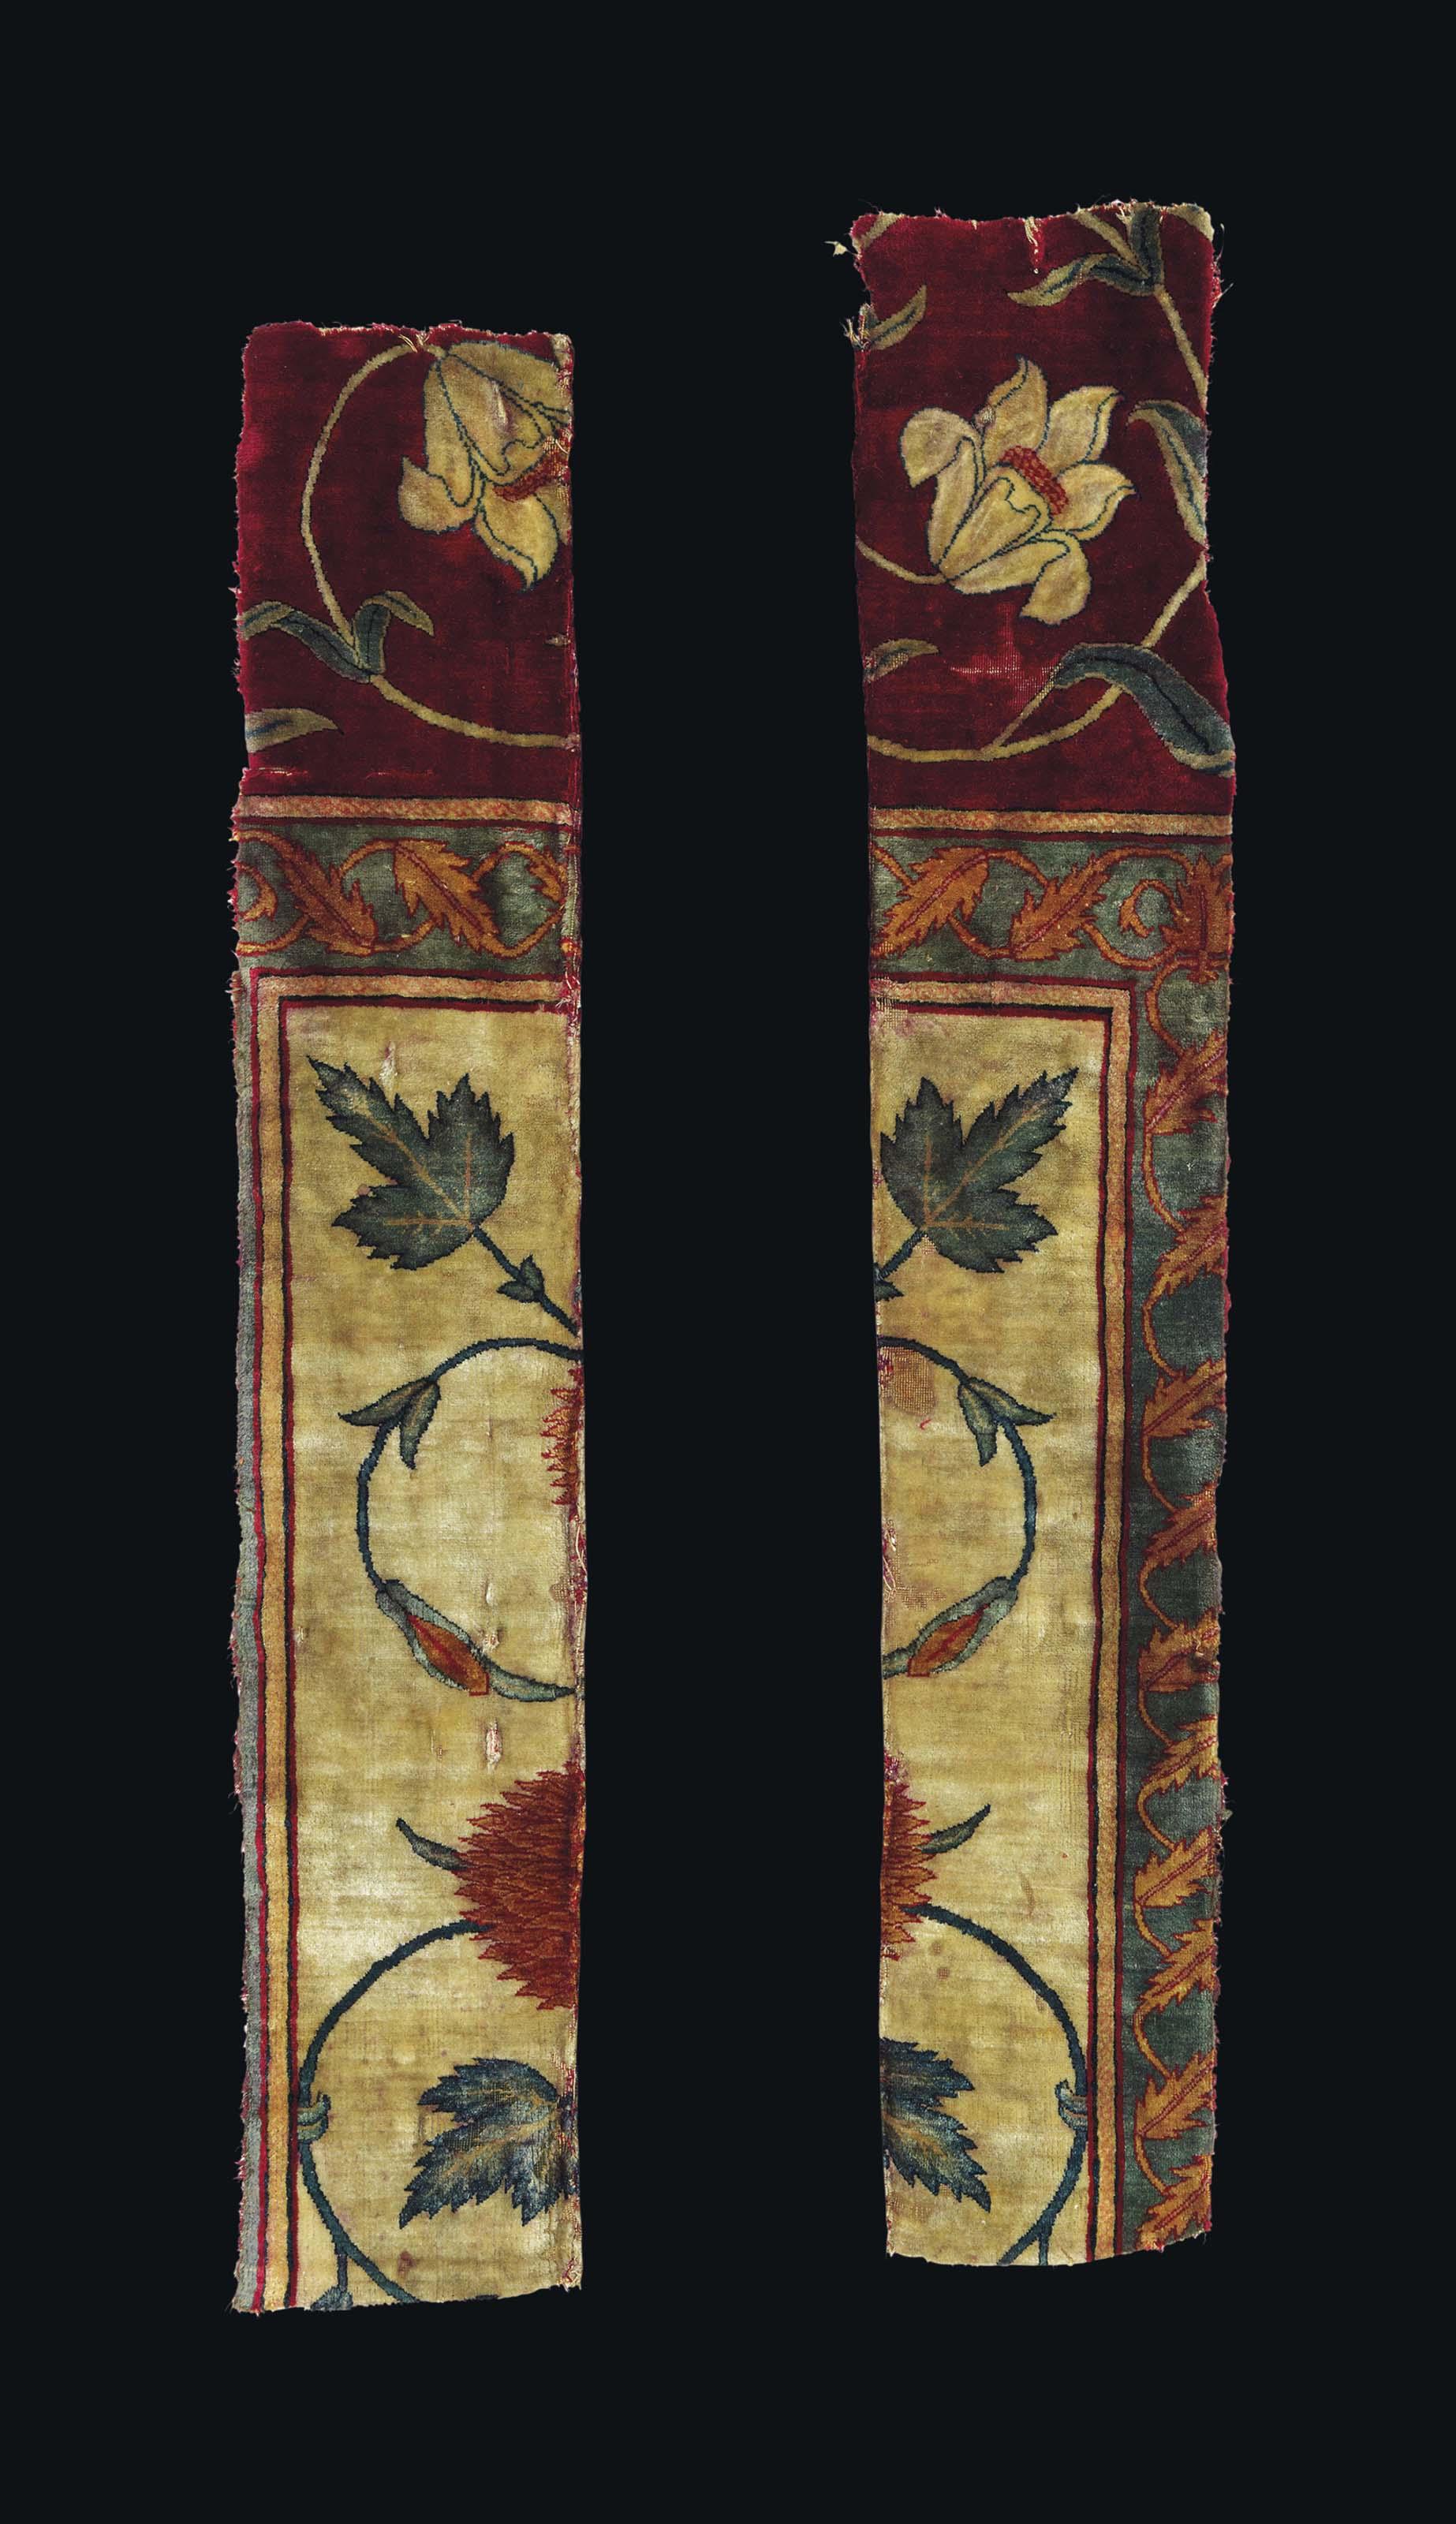 A Rare Mughal Pashmina Carpet Fragment North India